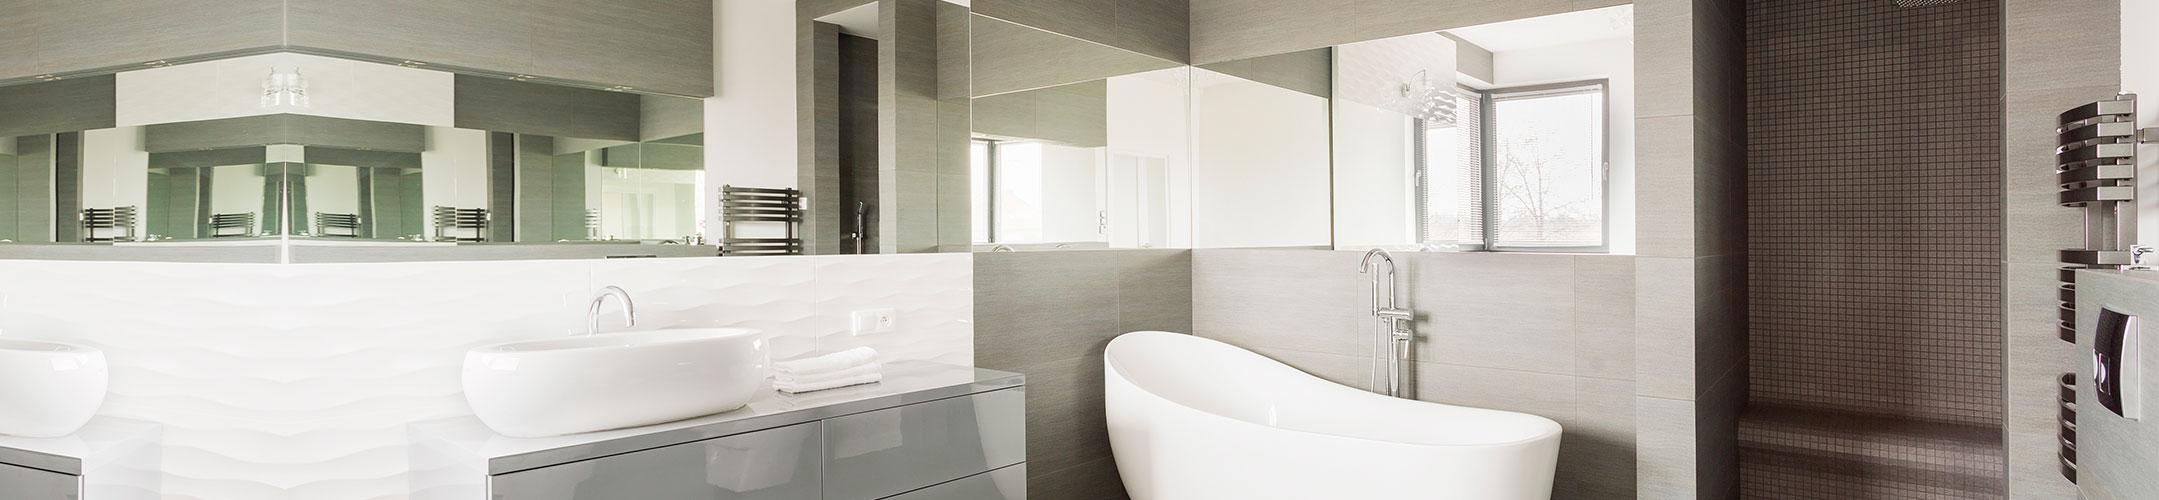 fliesen latifi in darmstadt fliesen verlegen bad sanierung. Black Bedroom Furniture Sets. Home Design Ideas